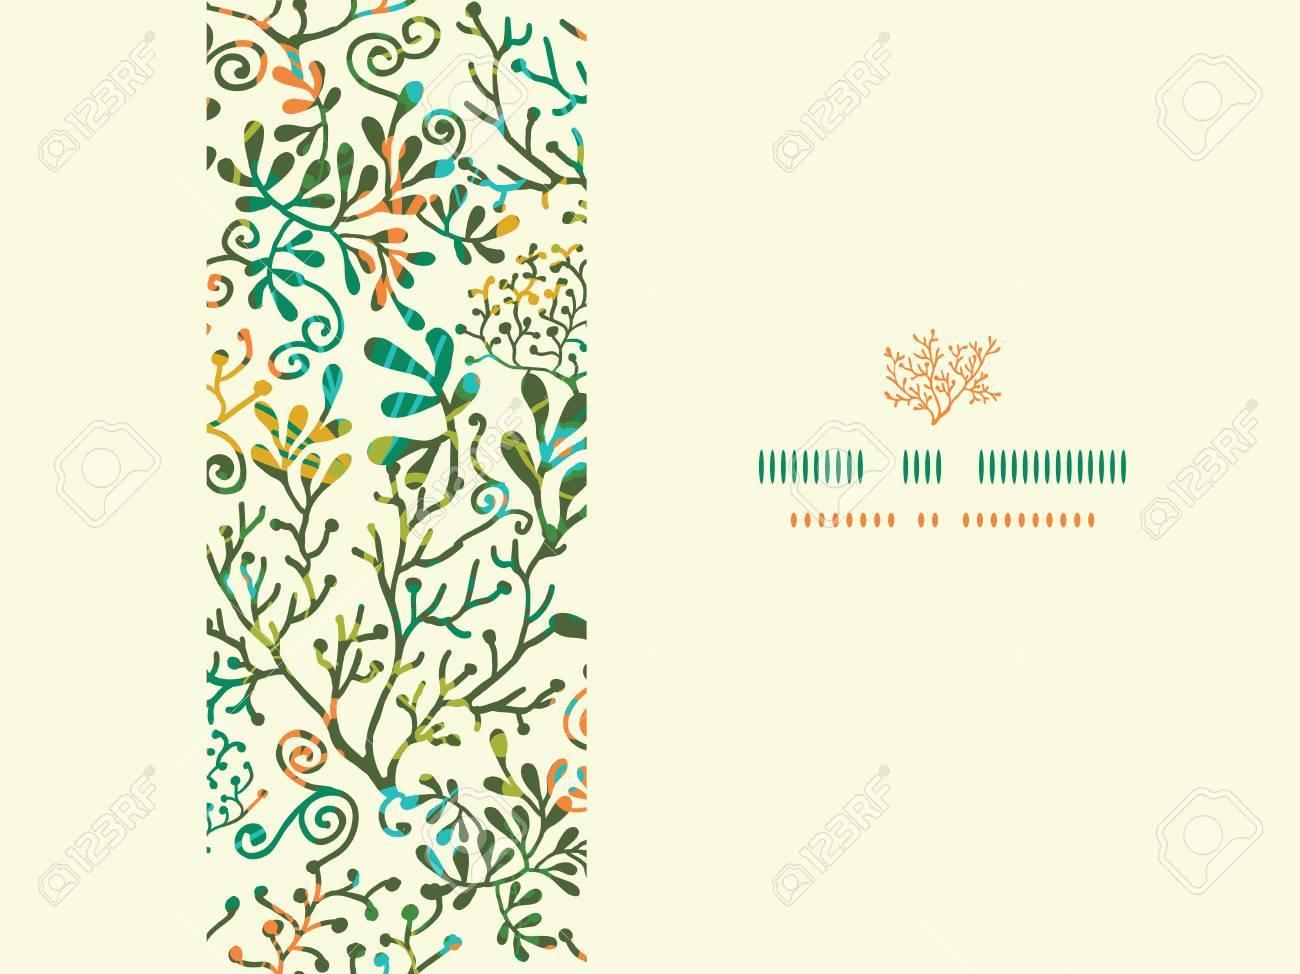 Textured Plants Horizontal Seamless Pattern Background Stock Vector - 19197161